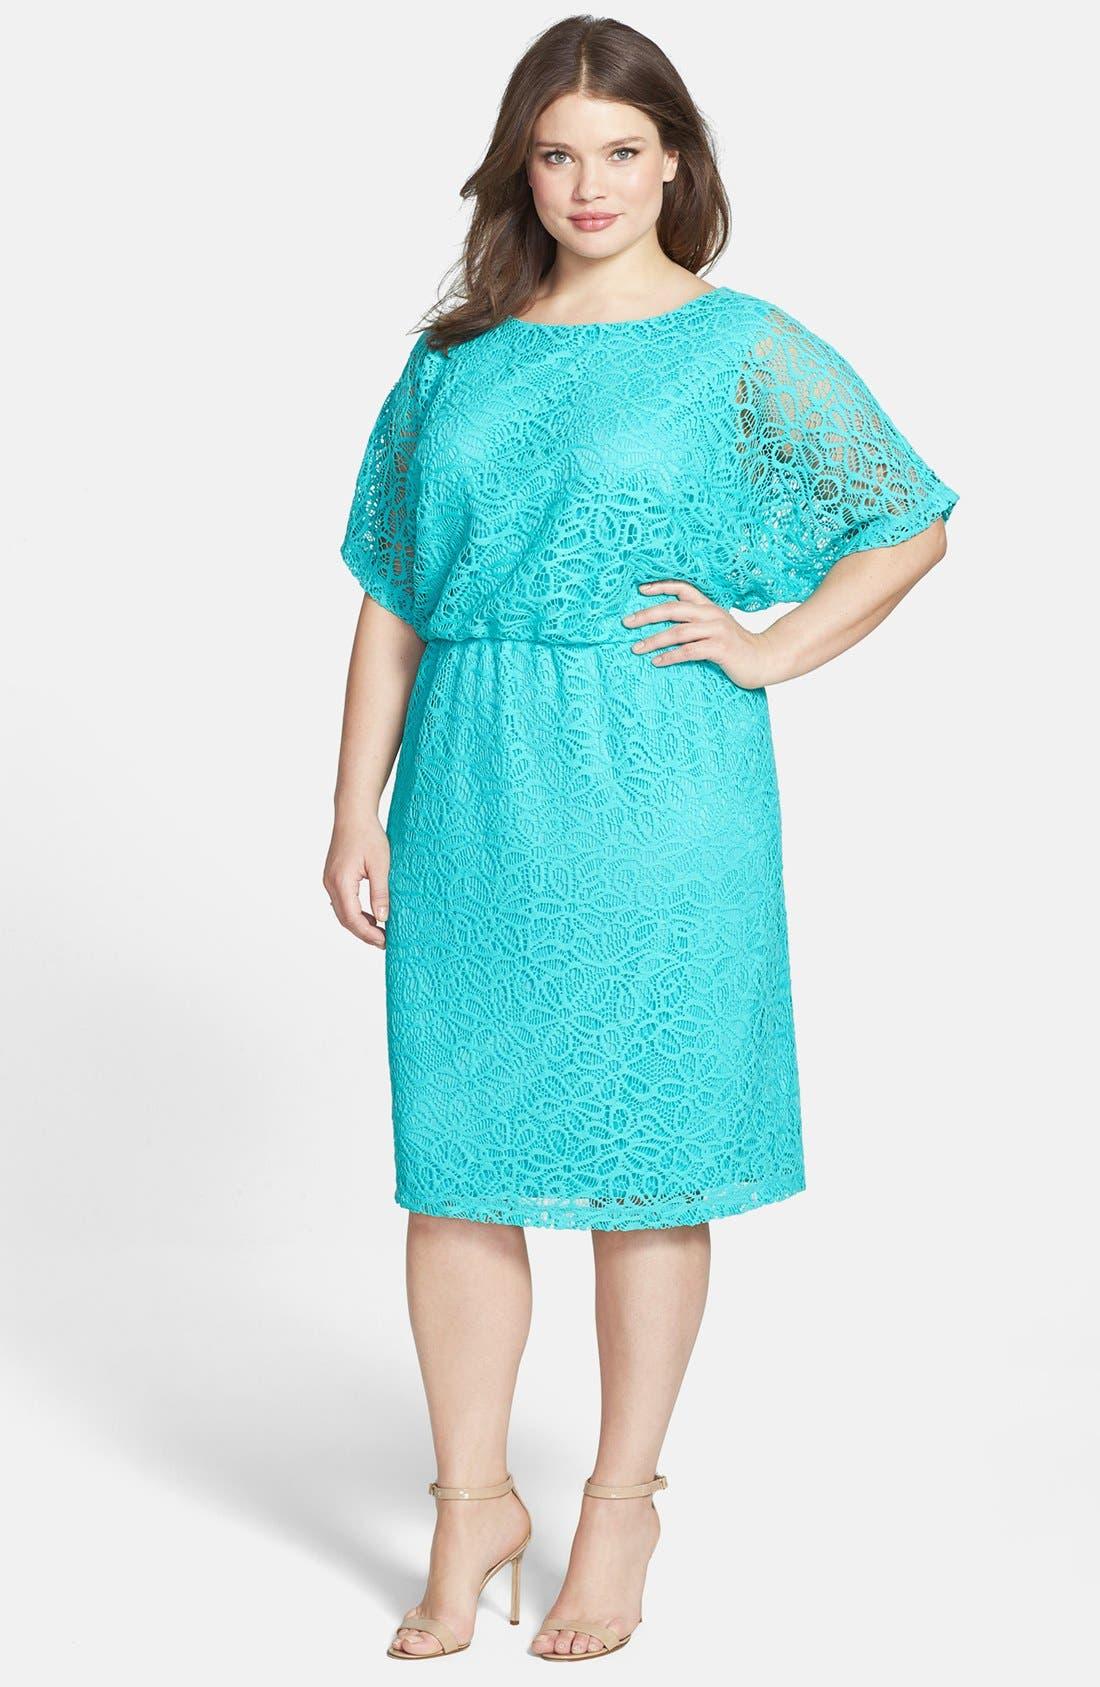 Alternate Image 1 Selected - London Times 'Kimono' Lace Dress (Plus Size)